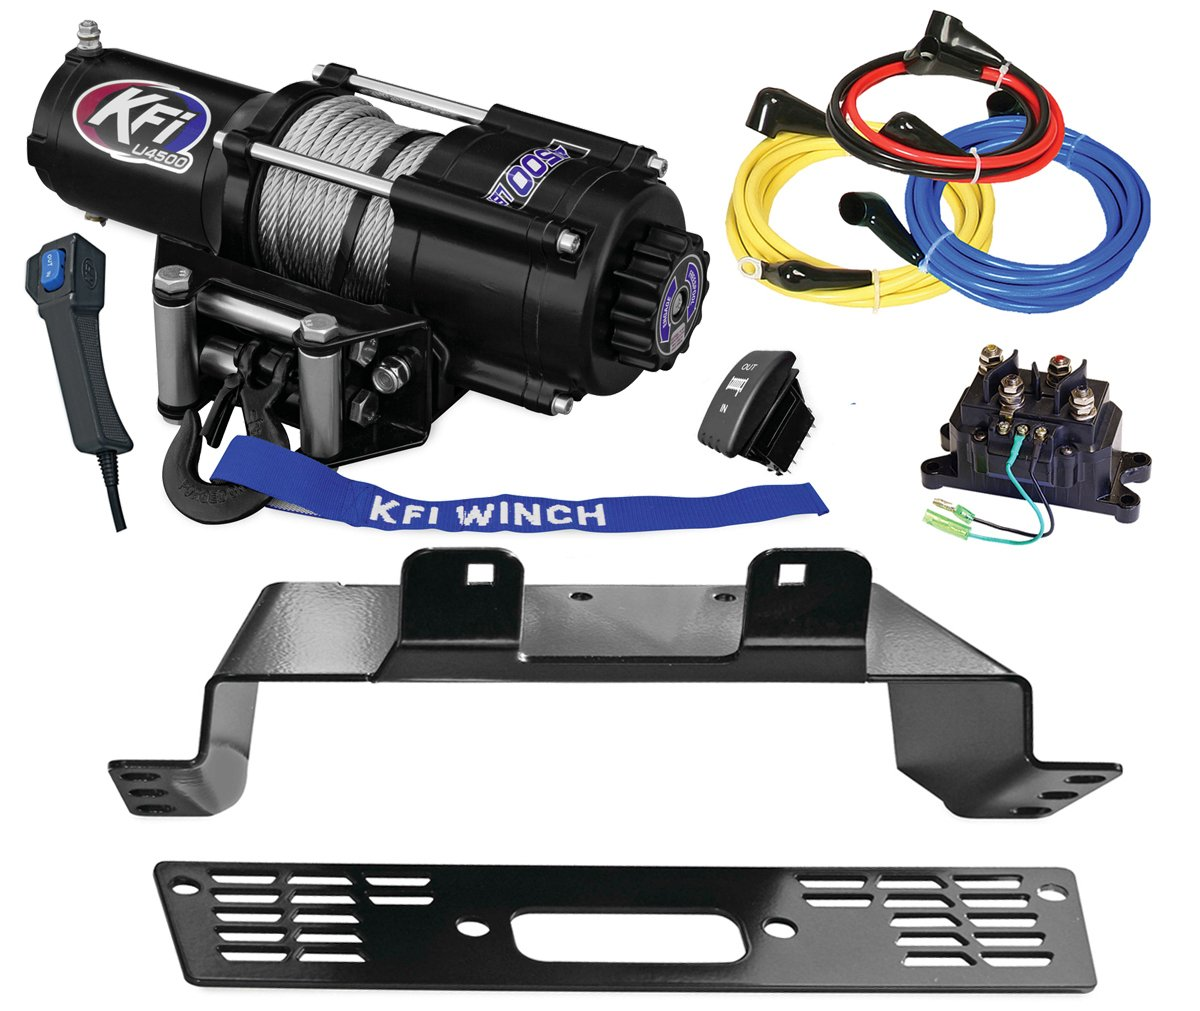 2014-2018 Polaris 570 Ranger 4x4 KFI U45-R2 Winch /& Mount Combo Kit Midsize